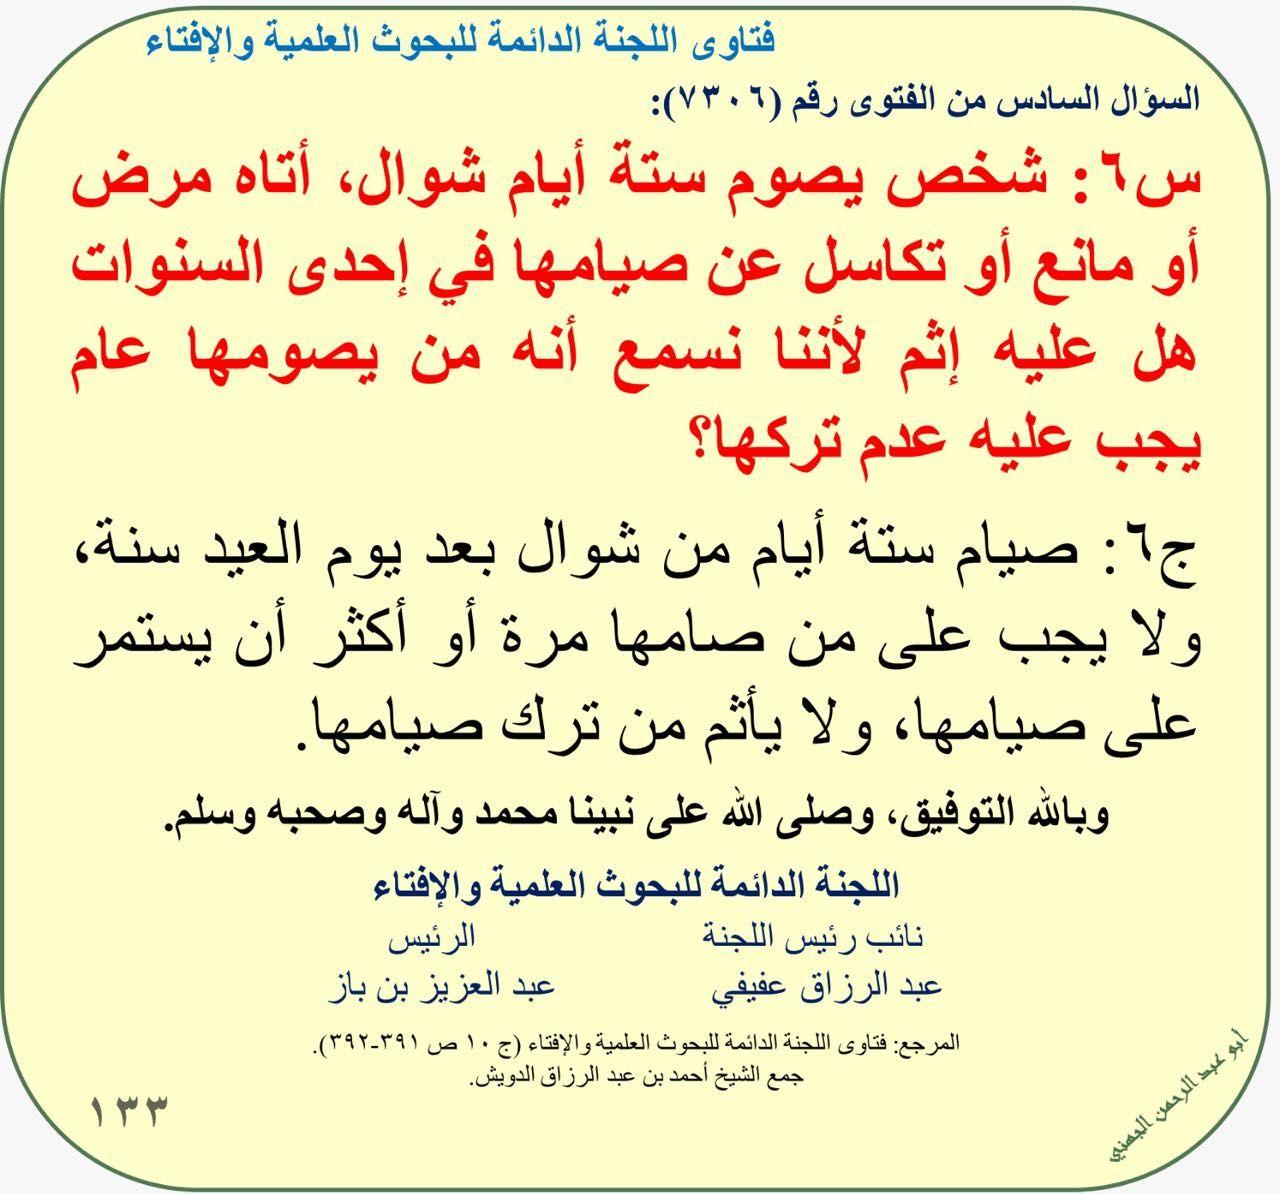 Pin By Malak Salah On بطاقات إسلامية Math Math Equations Allah